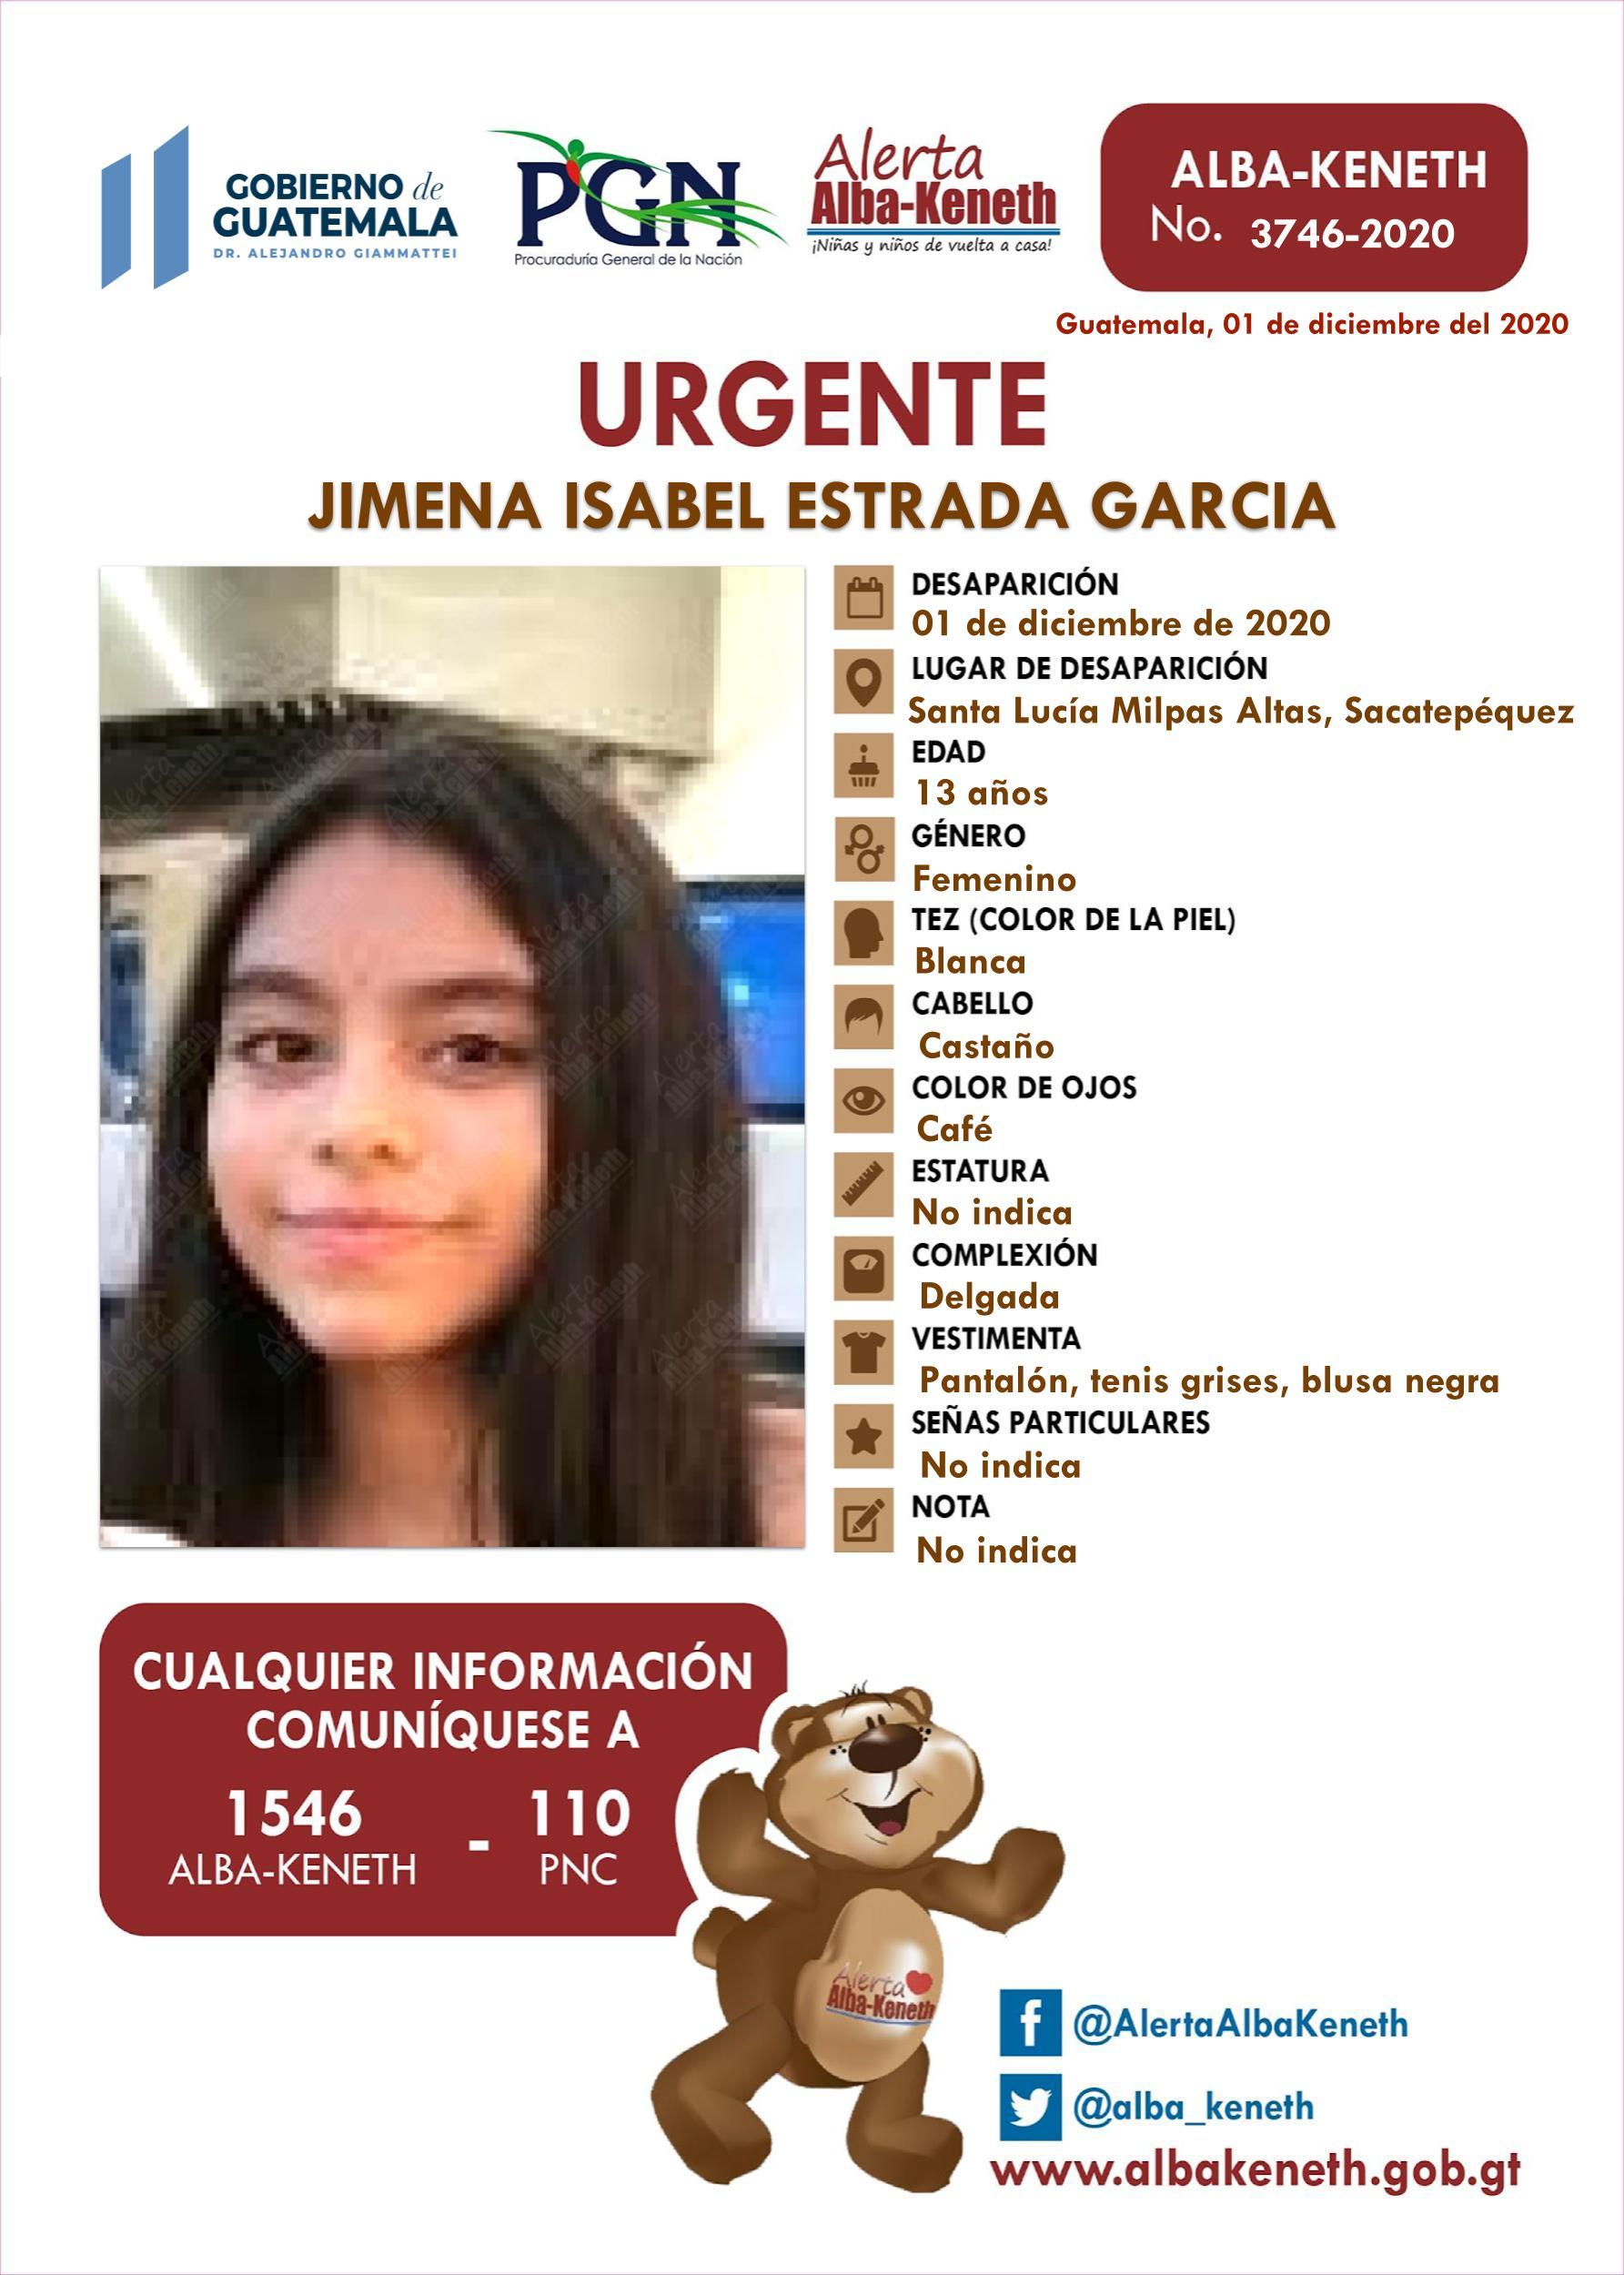 Jimena Isabel Estrada Garcia